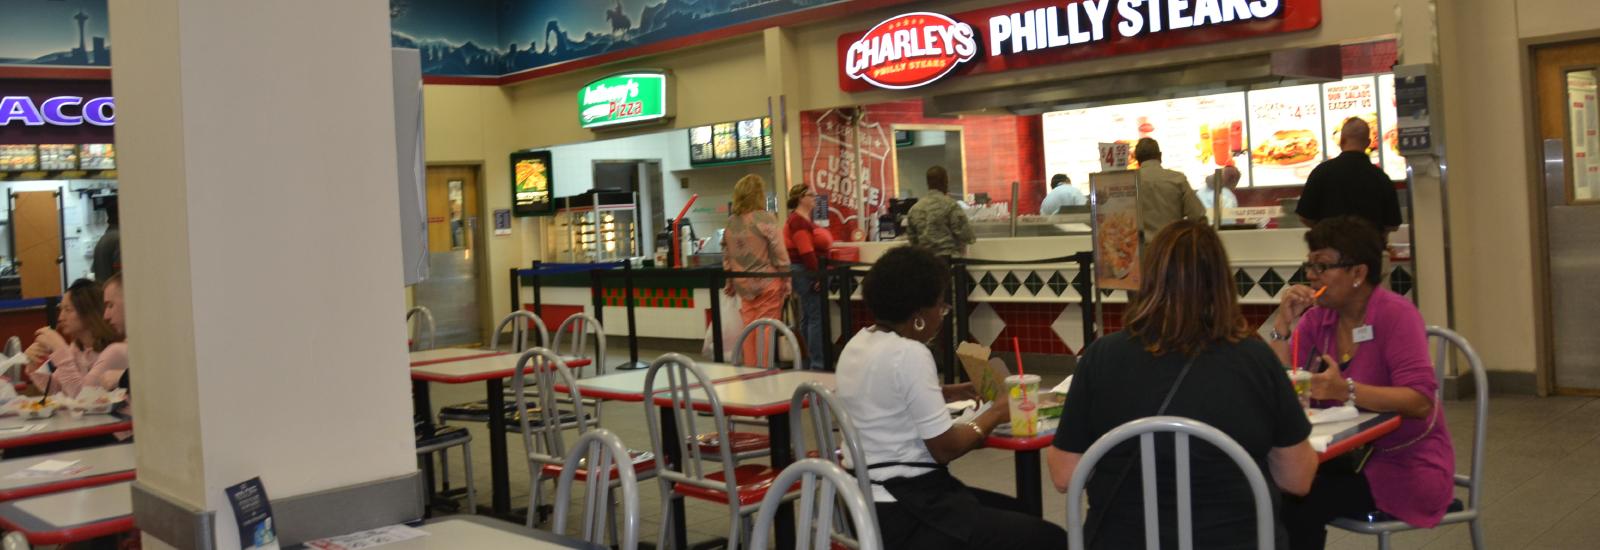 Barksdale AFB BX Food Court